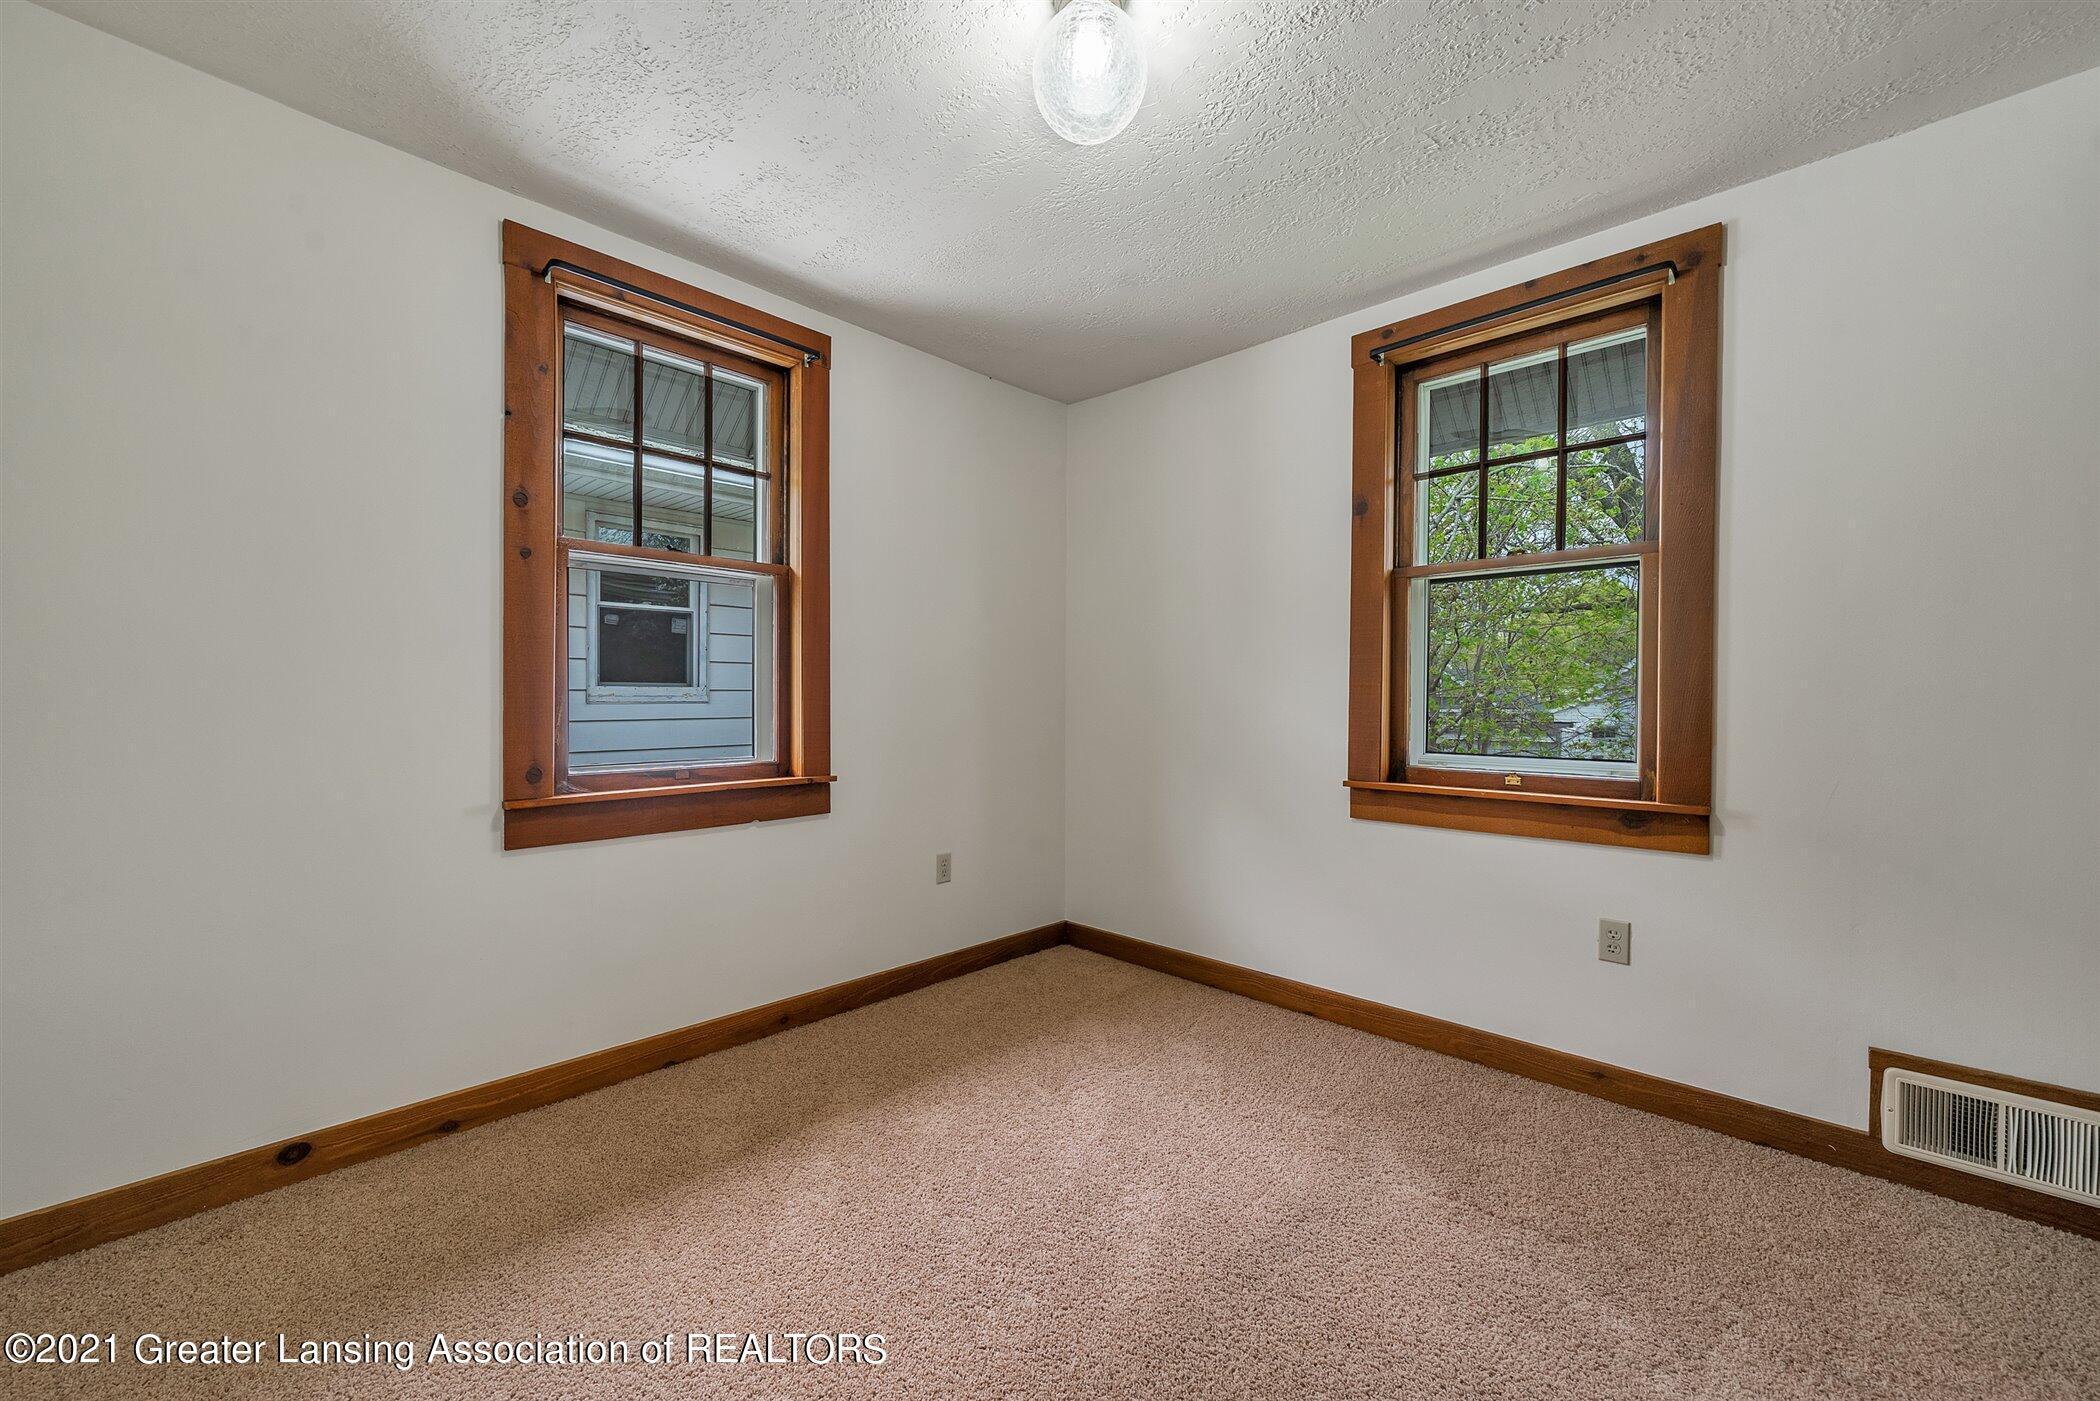 726 N Magnolia Ave - (15) UPPER LEVEL Bedroom 2 - 18